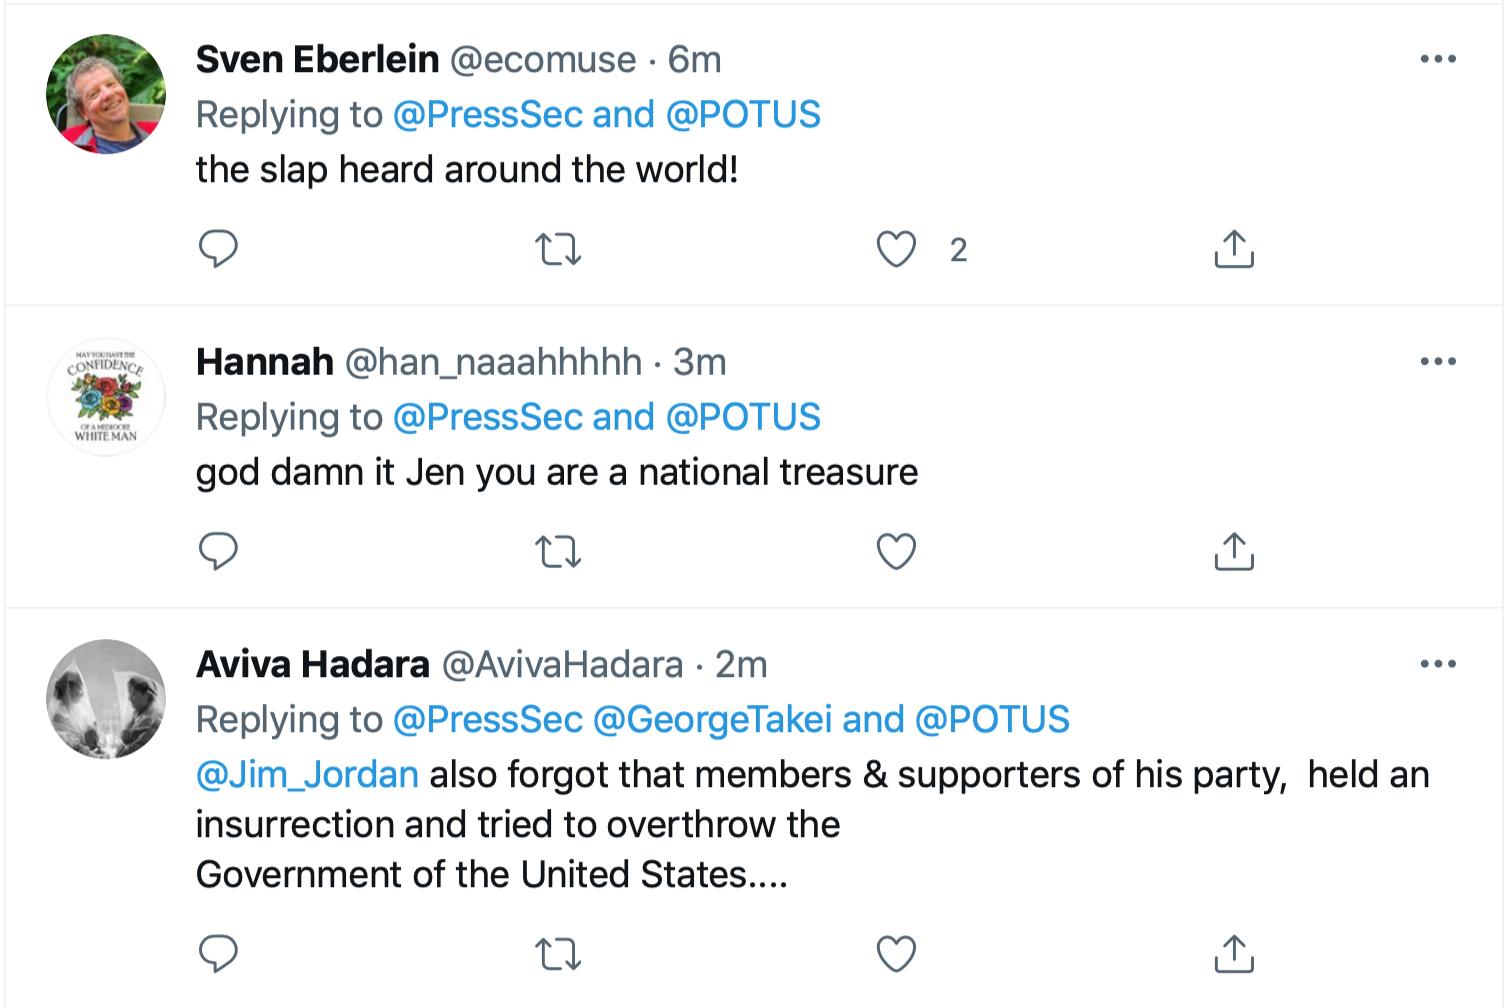 Screen-Shot-2021-06-21-at-12.58.50-PM Jen Psaki Makes Jim Jordan Look Even Dumber Than Usual Economy Featured Joe Biden Politics Top Stories Twitter